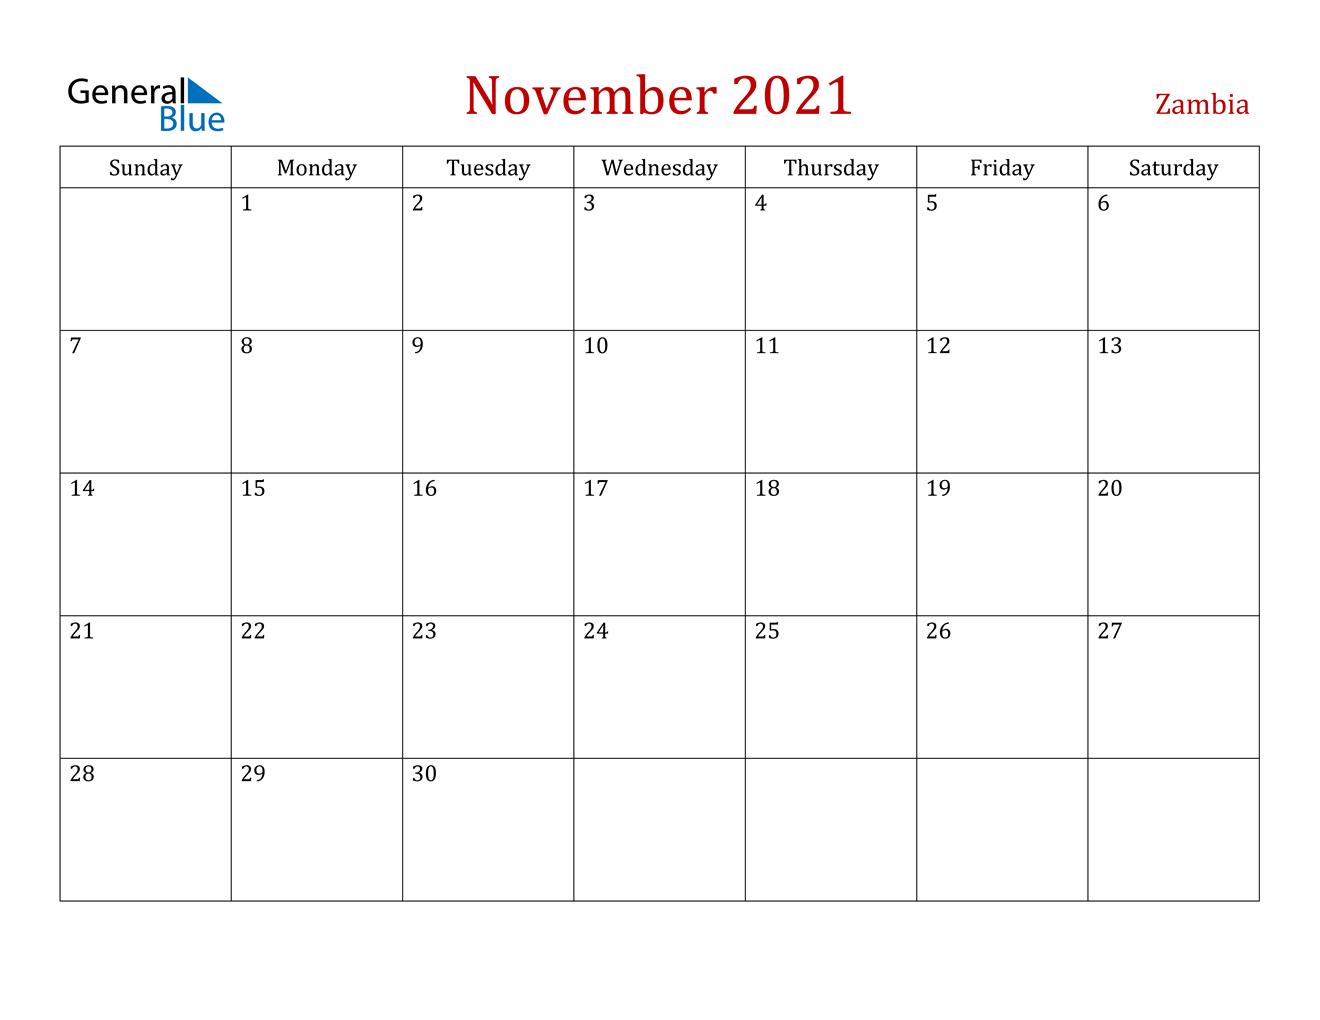 Zambia November 2021 Calendar with Holidays